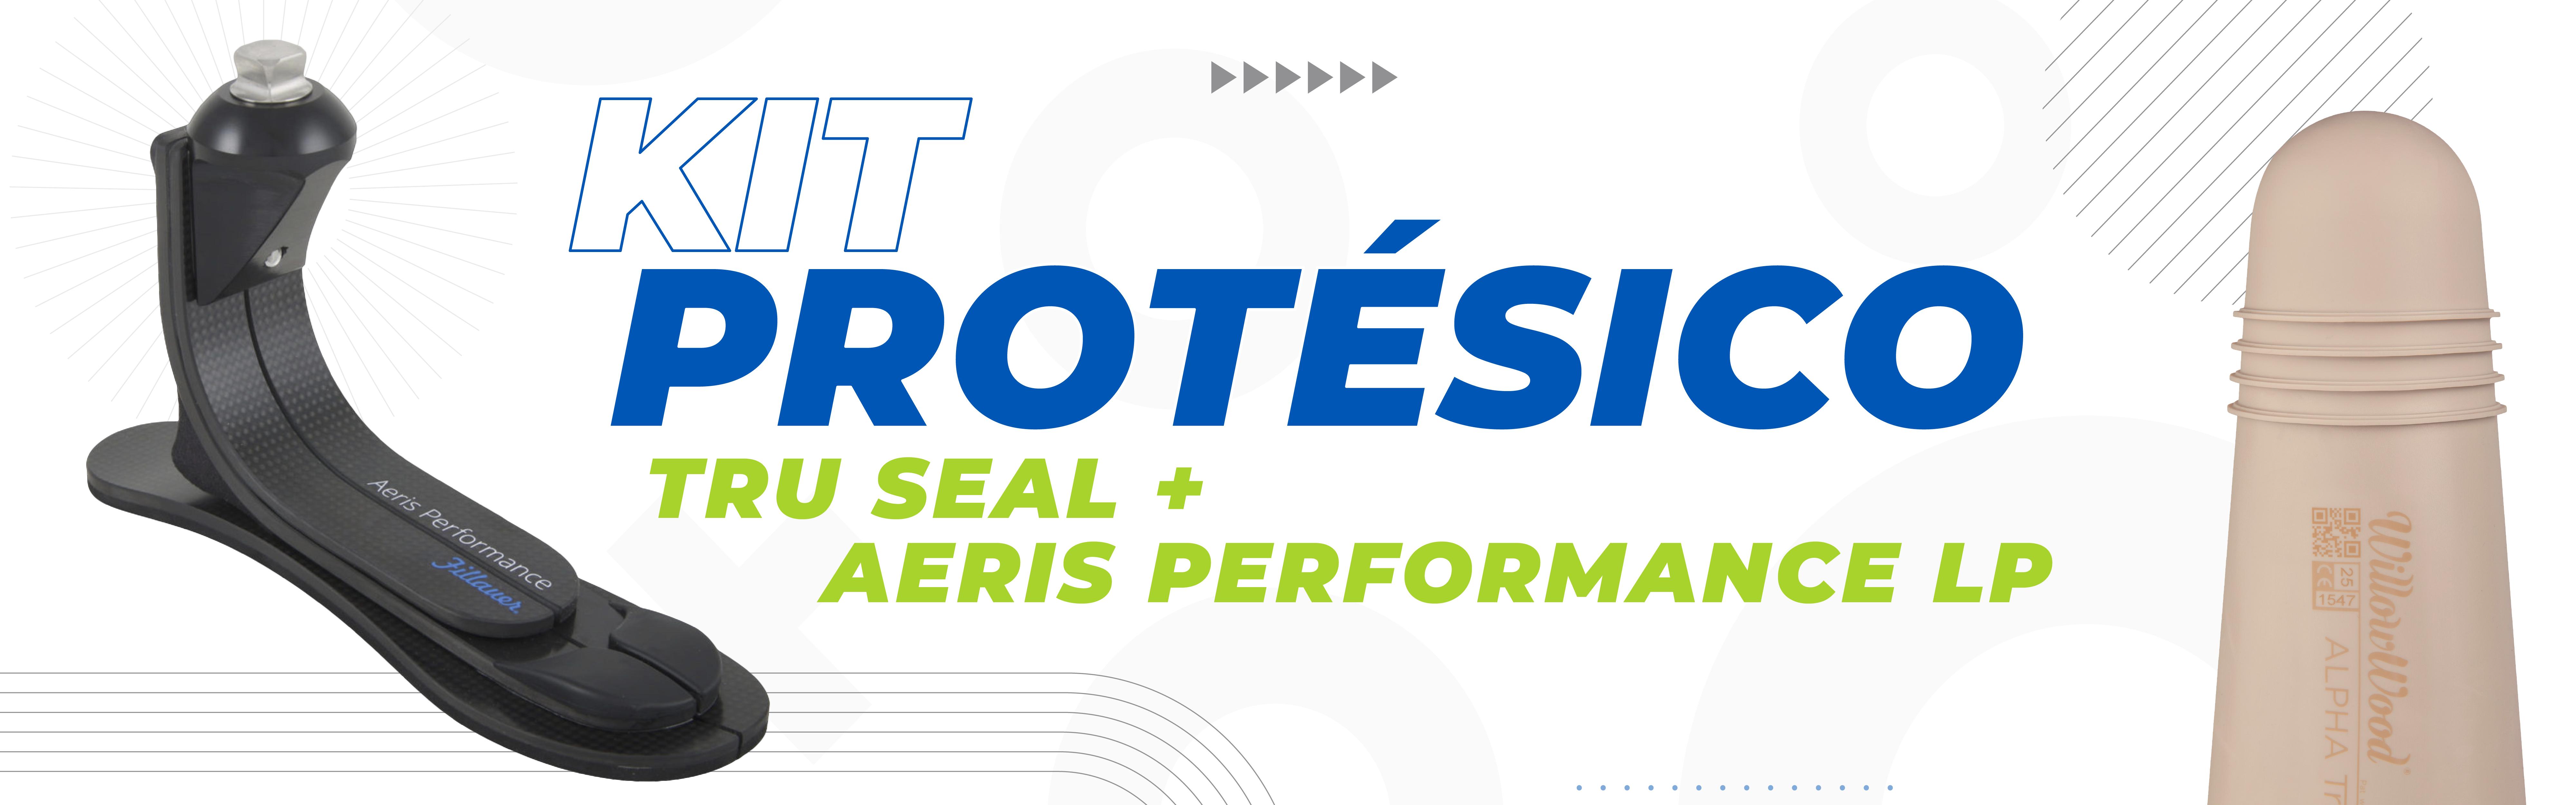 Kit Protesica: TRUSEAL + Performance LP